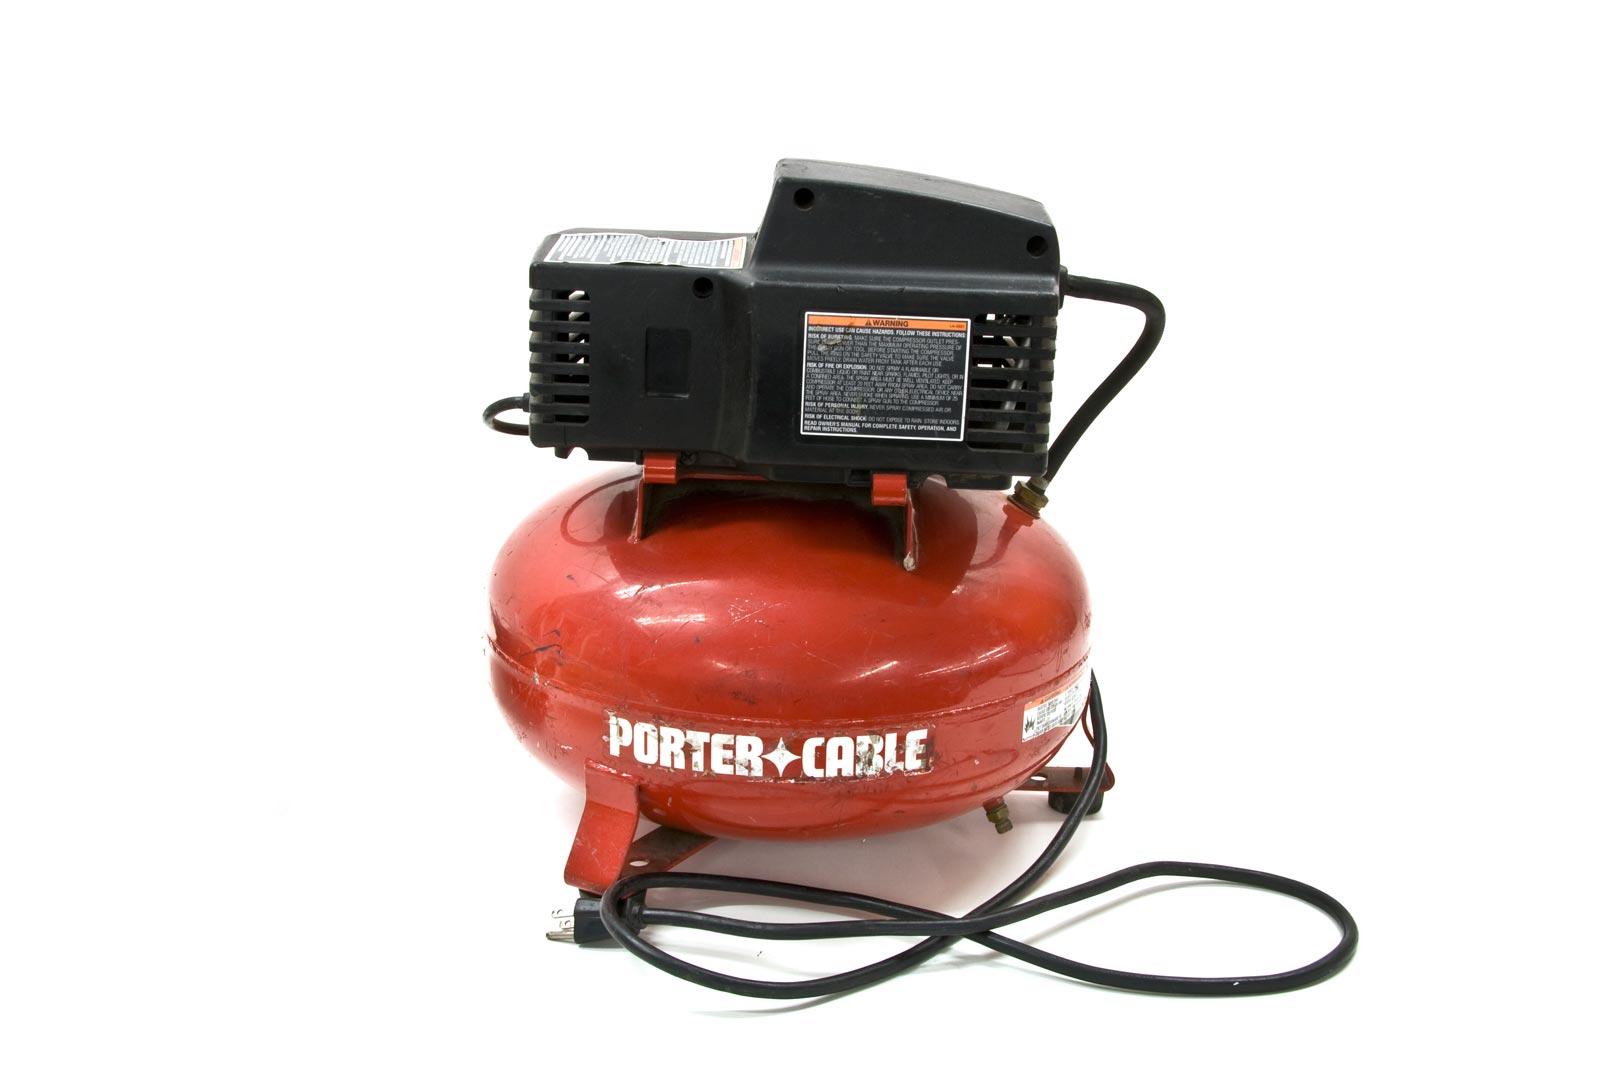 Porter Cable Compressor Deals On 1001 Blocks